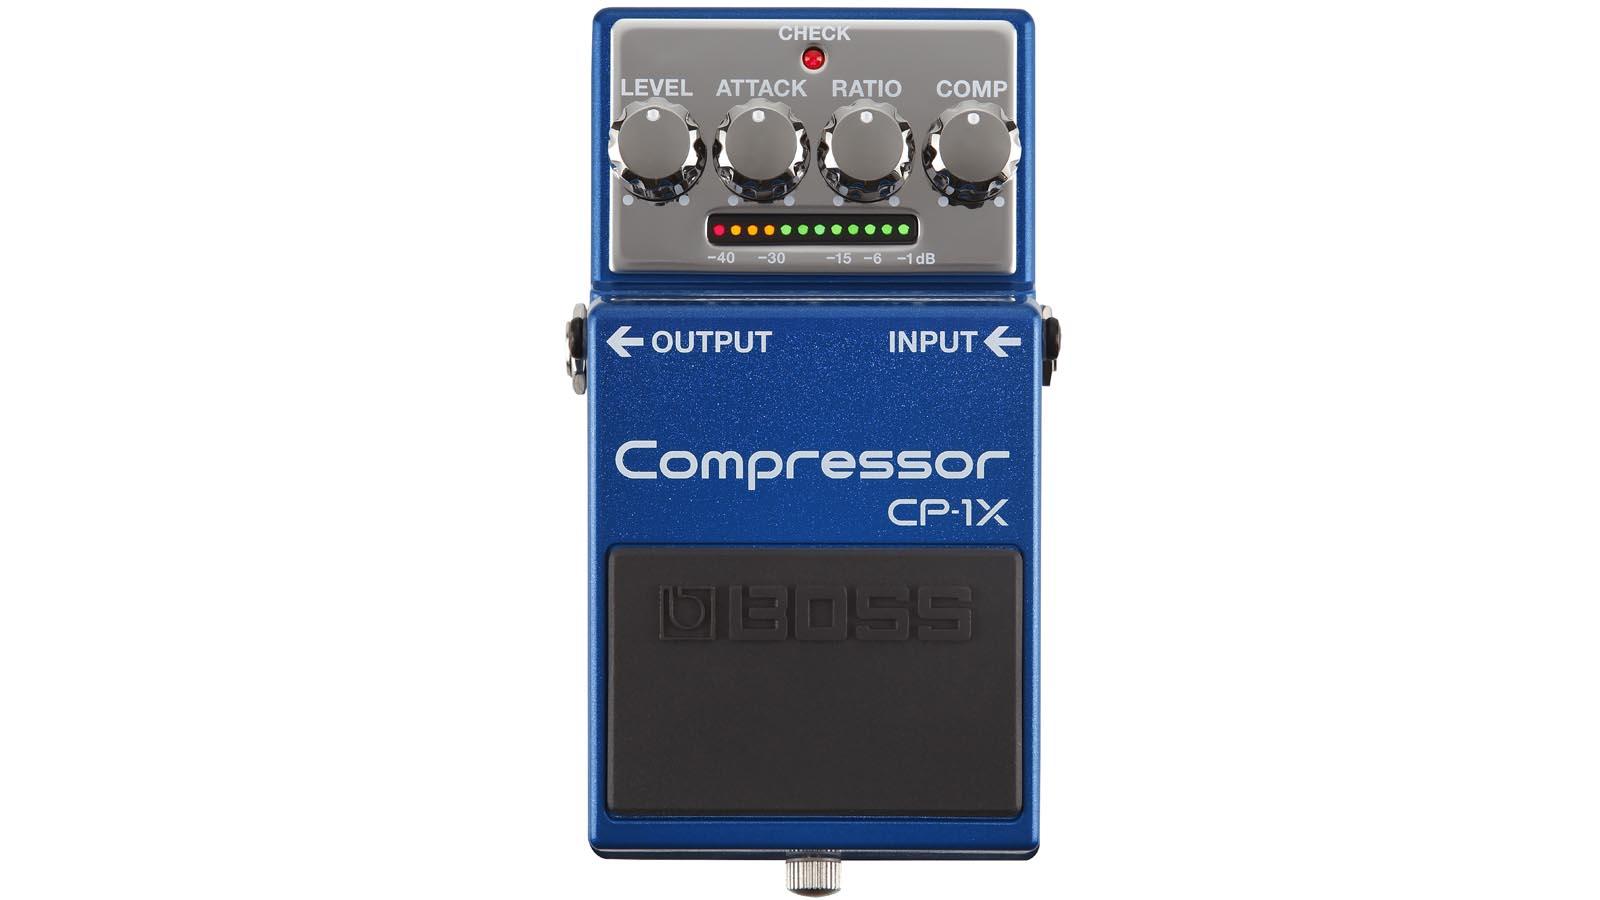 Boss CP-1X Multiband Kompressor